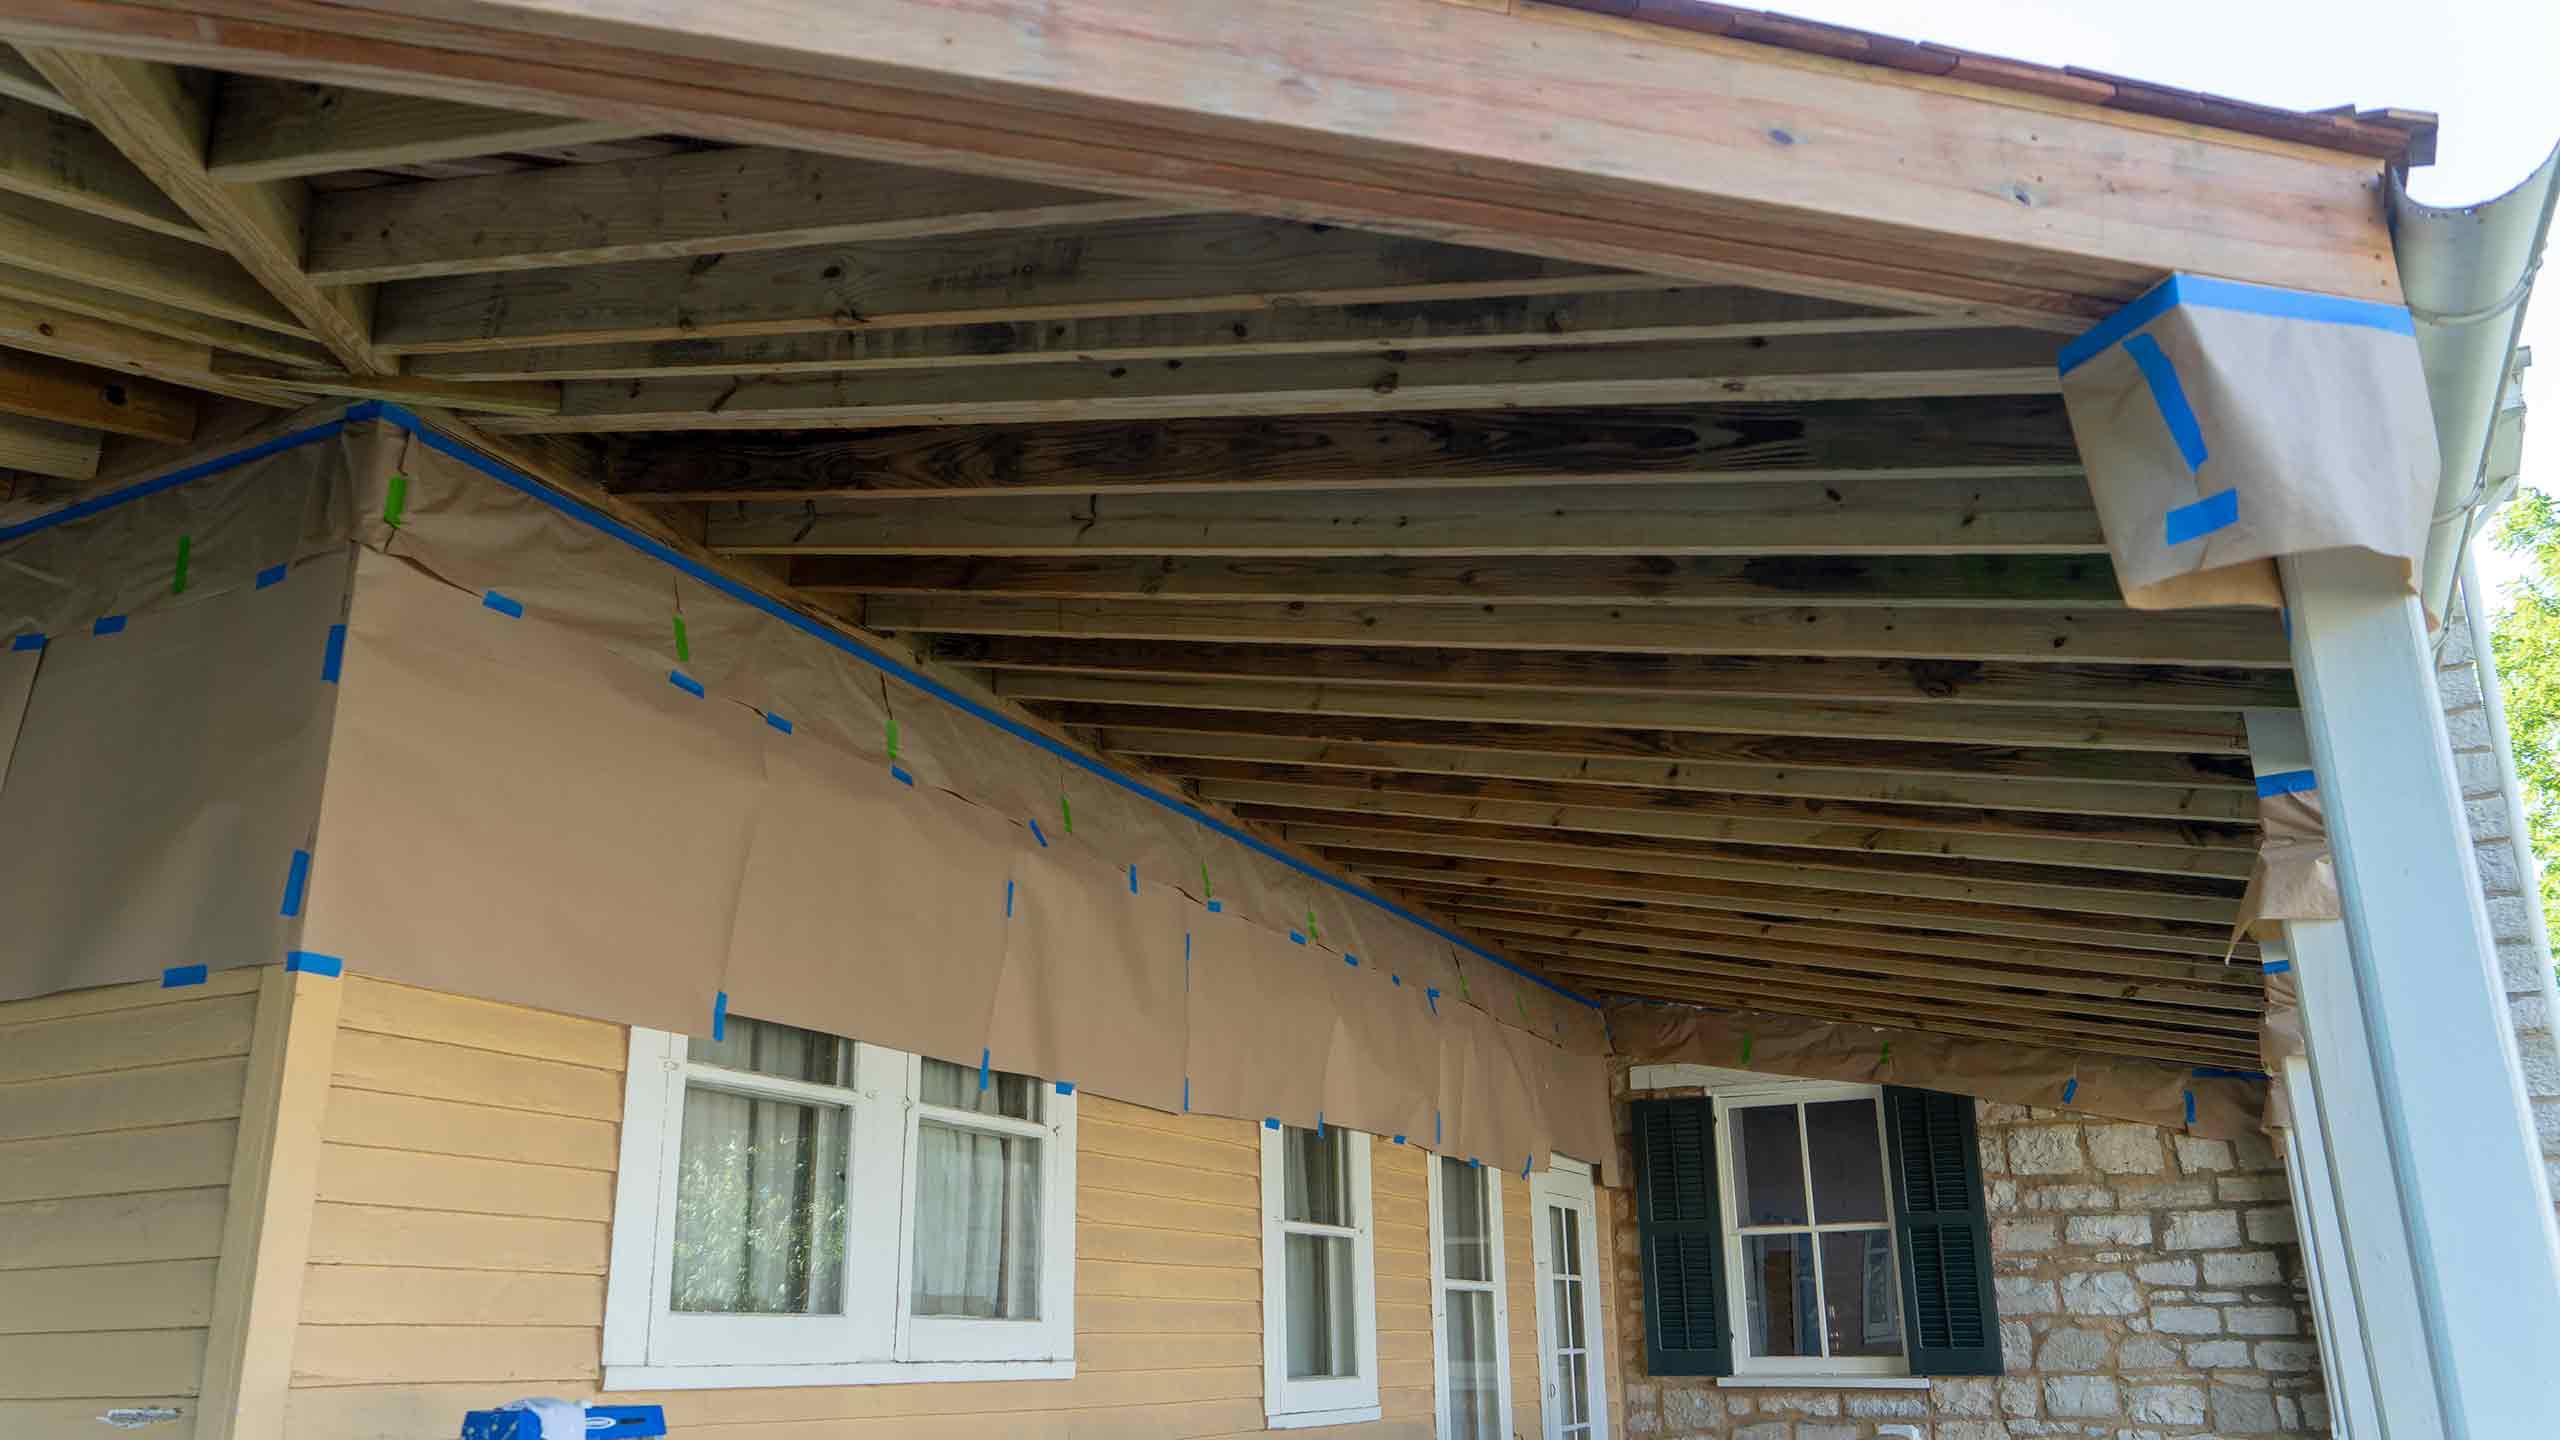 Mahaffie-Farmstead-Back-Porch-Roof-2